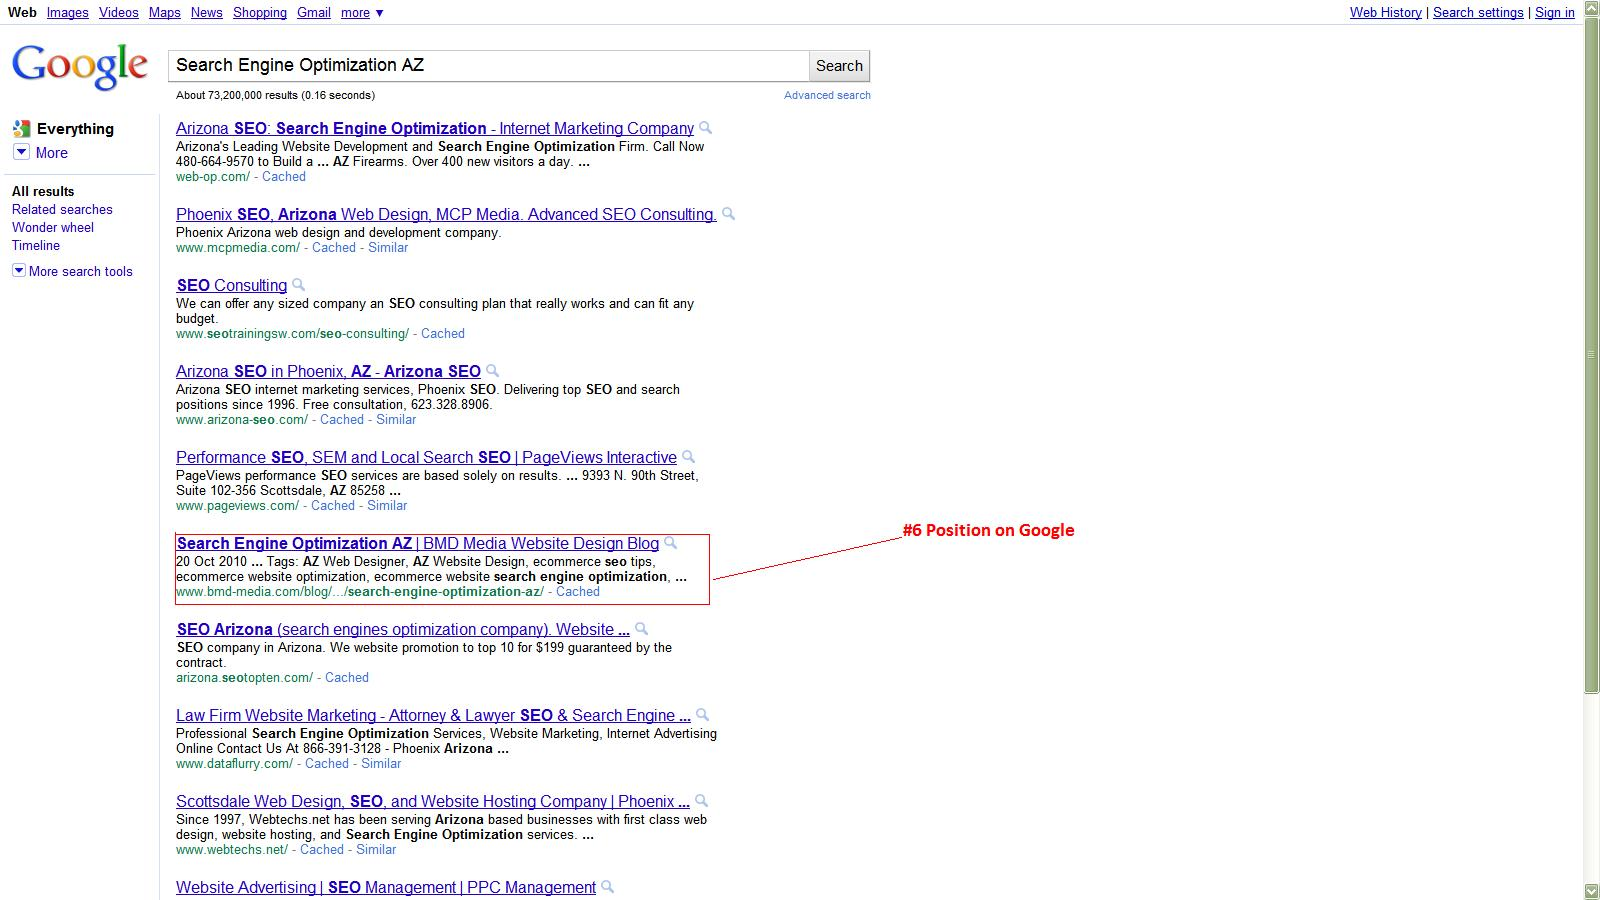 seo az search engine optimization az arizona search engine seo phoenix seo arizona search engine optimization az ranking result samples